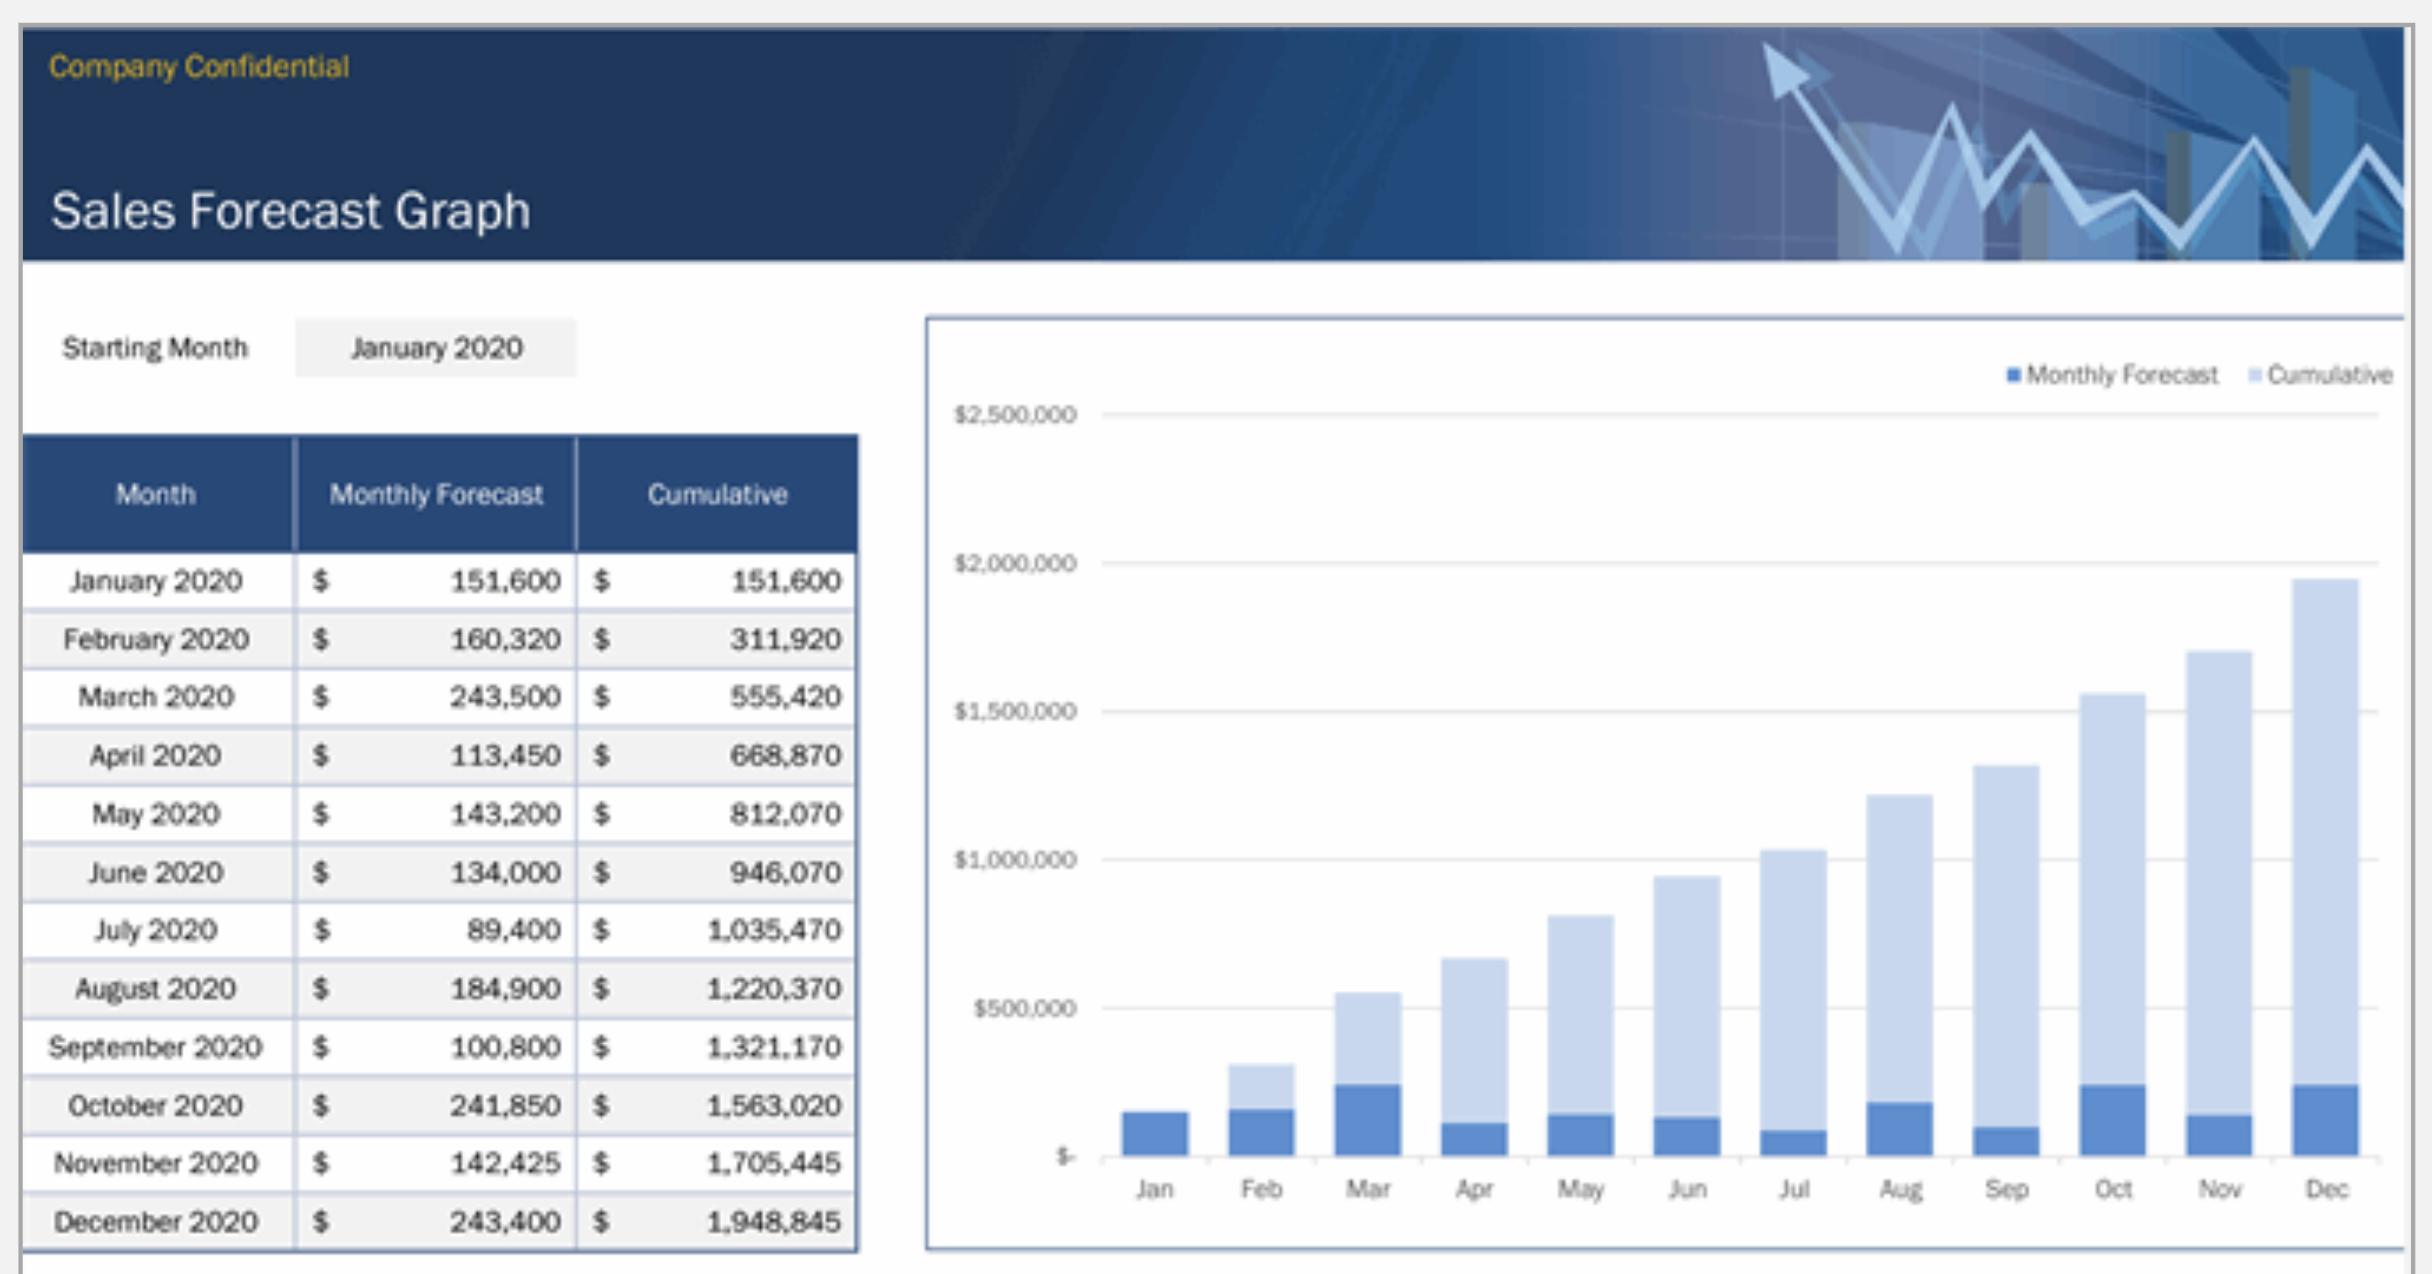 Sales Forecast Graph